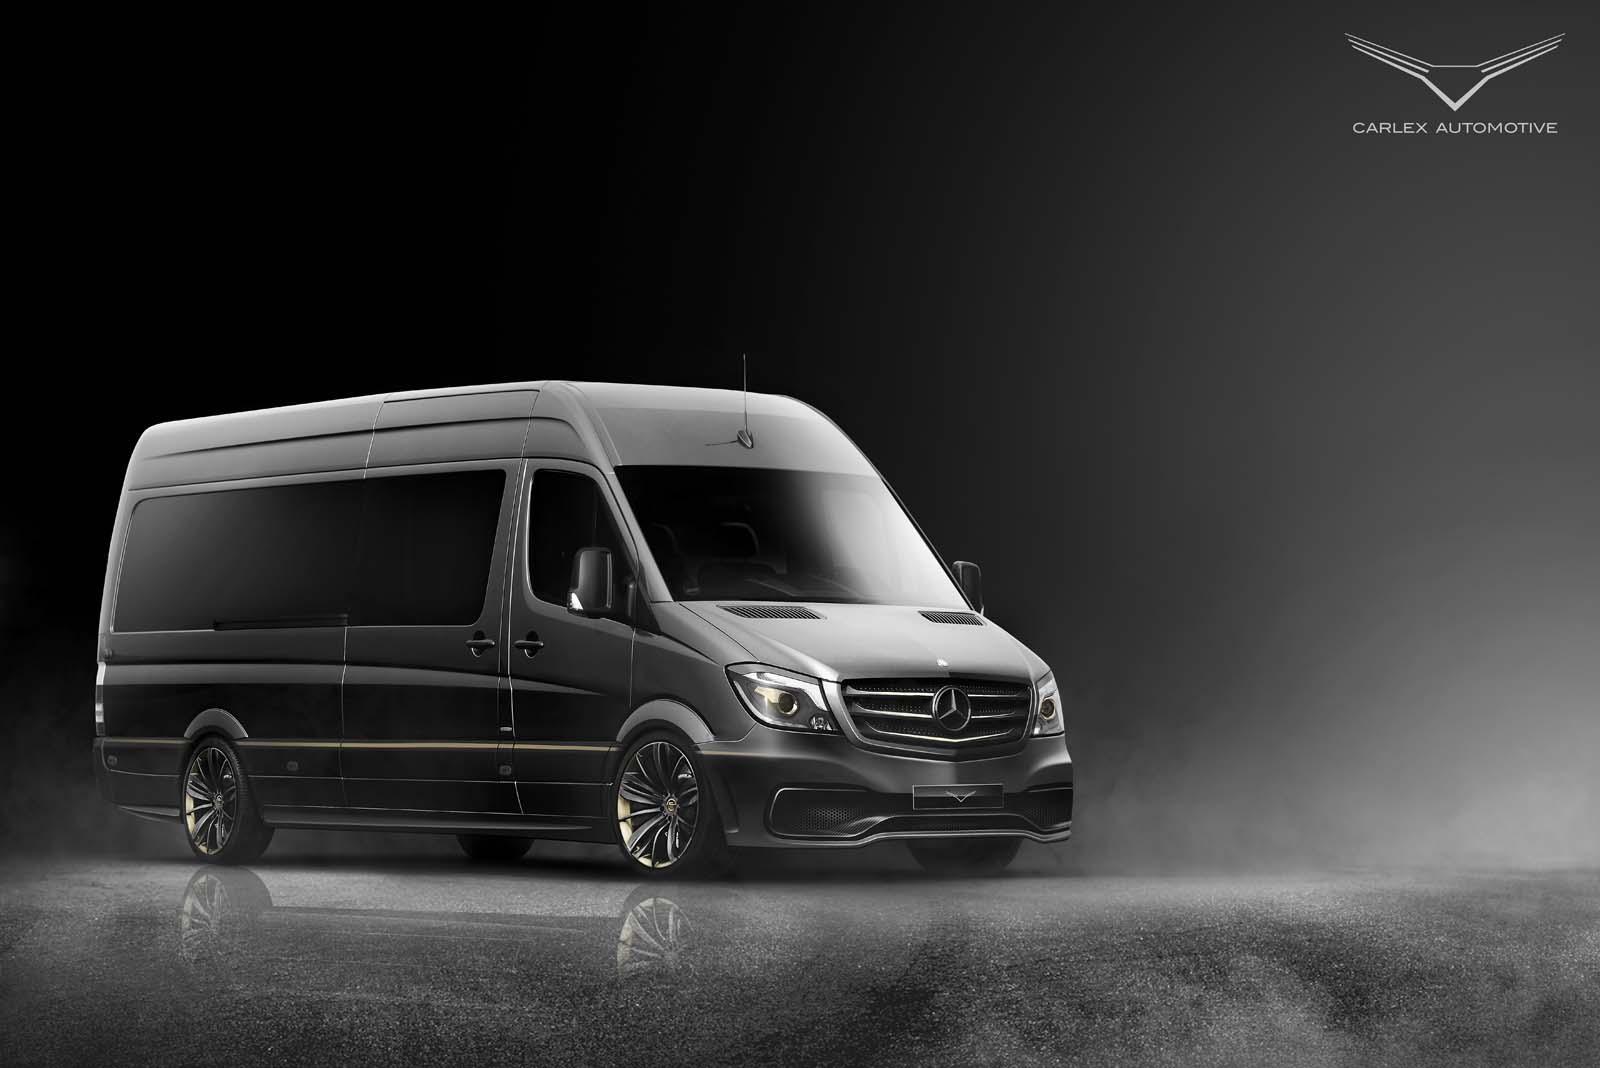 Mercedes-Benz Sprinter Carlex Design